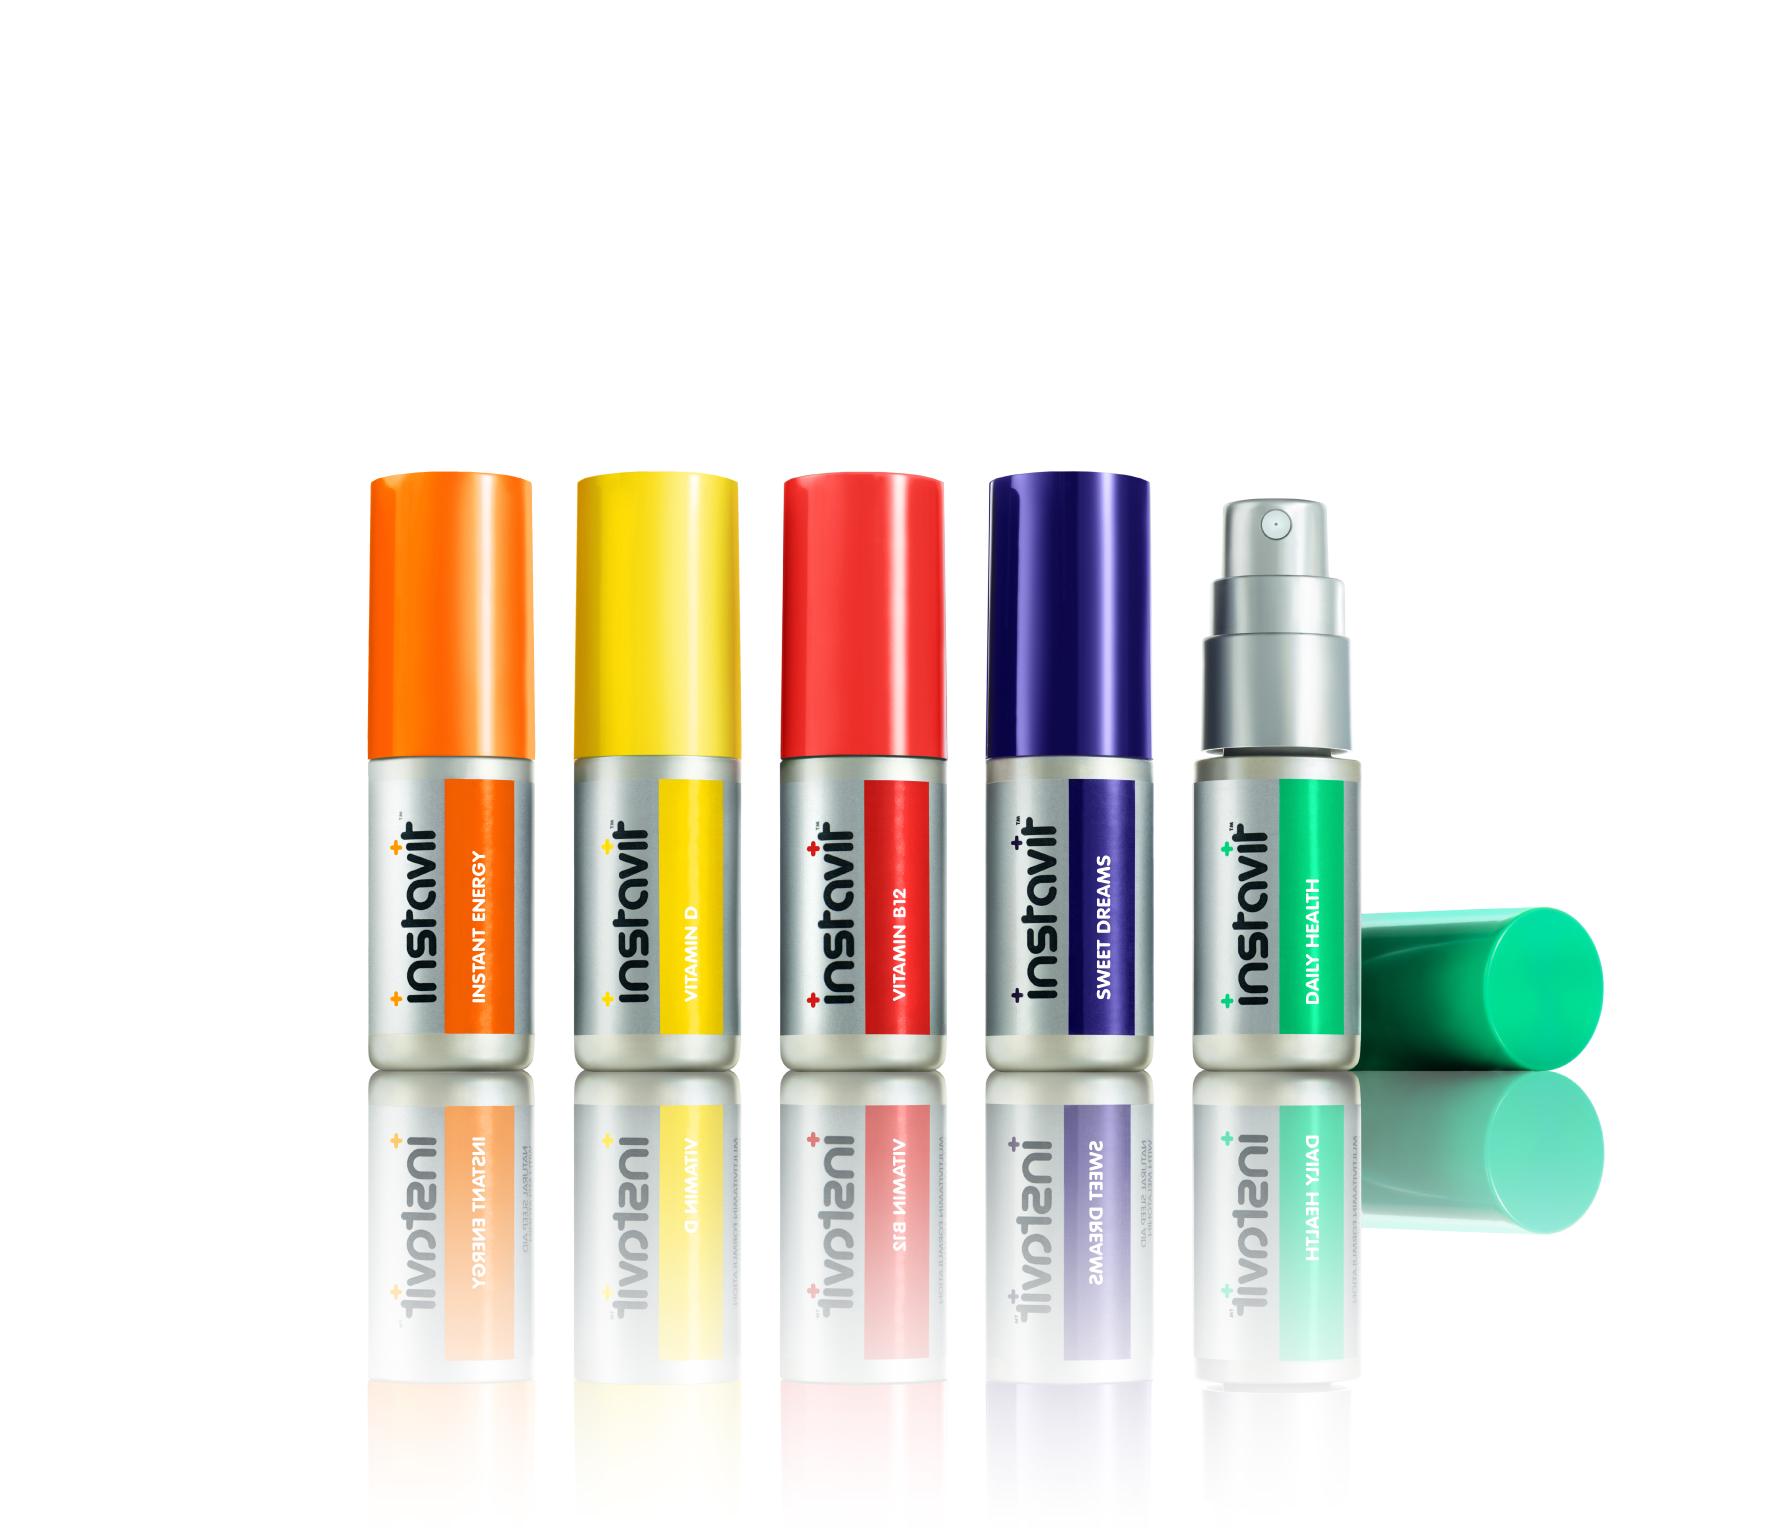 Instavit®: The Liquid Spray Vitamin For People On The Go